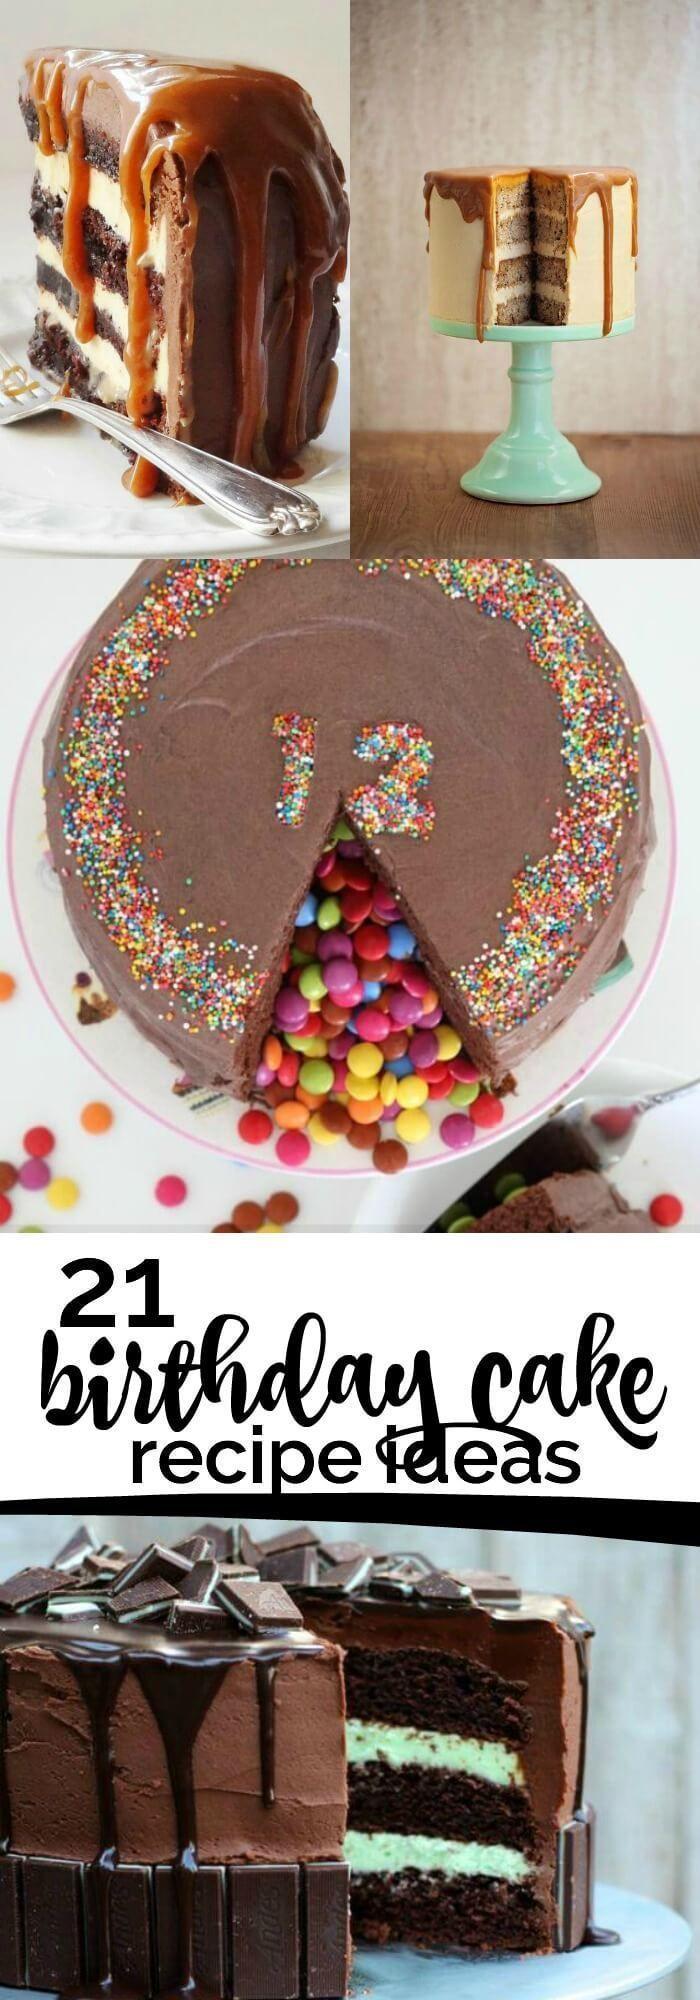 10 best birthday cake ideas images on Pinterest Anniversary cakes